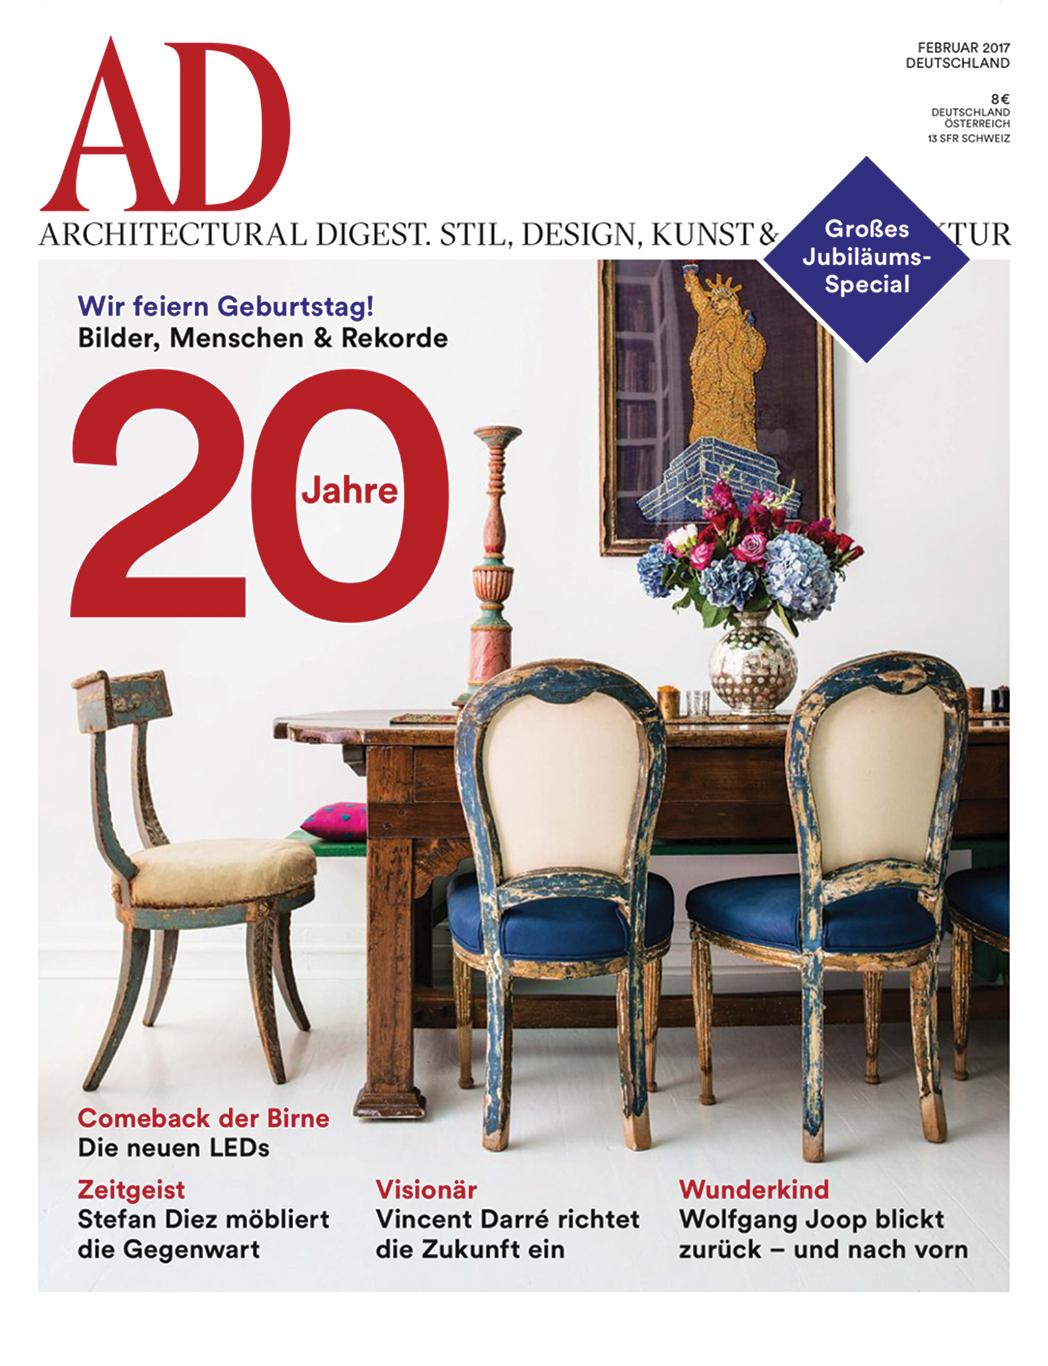 AD_Germany1.jpg